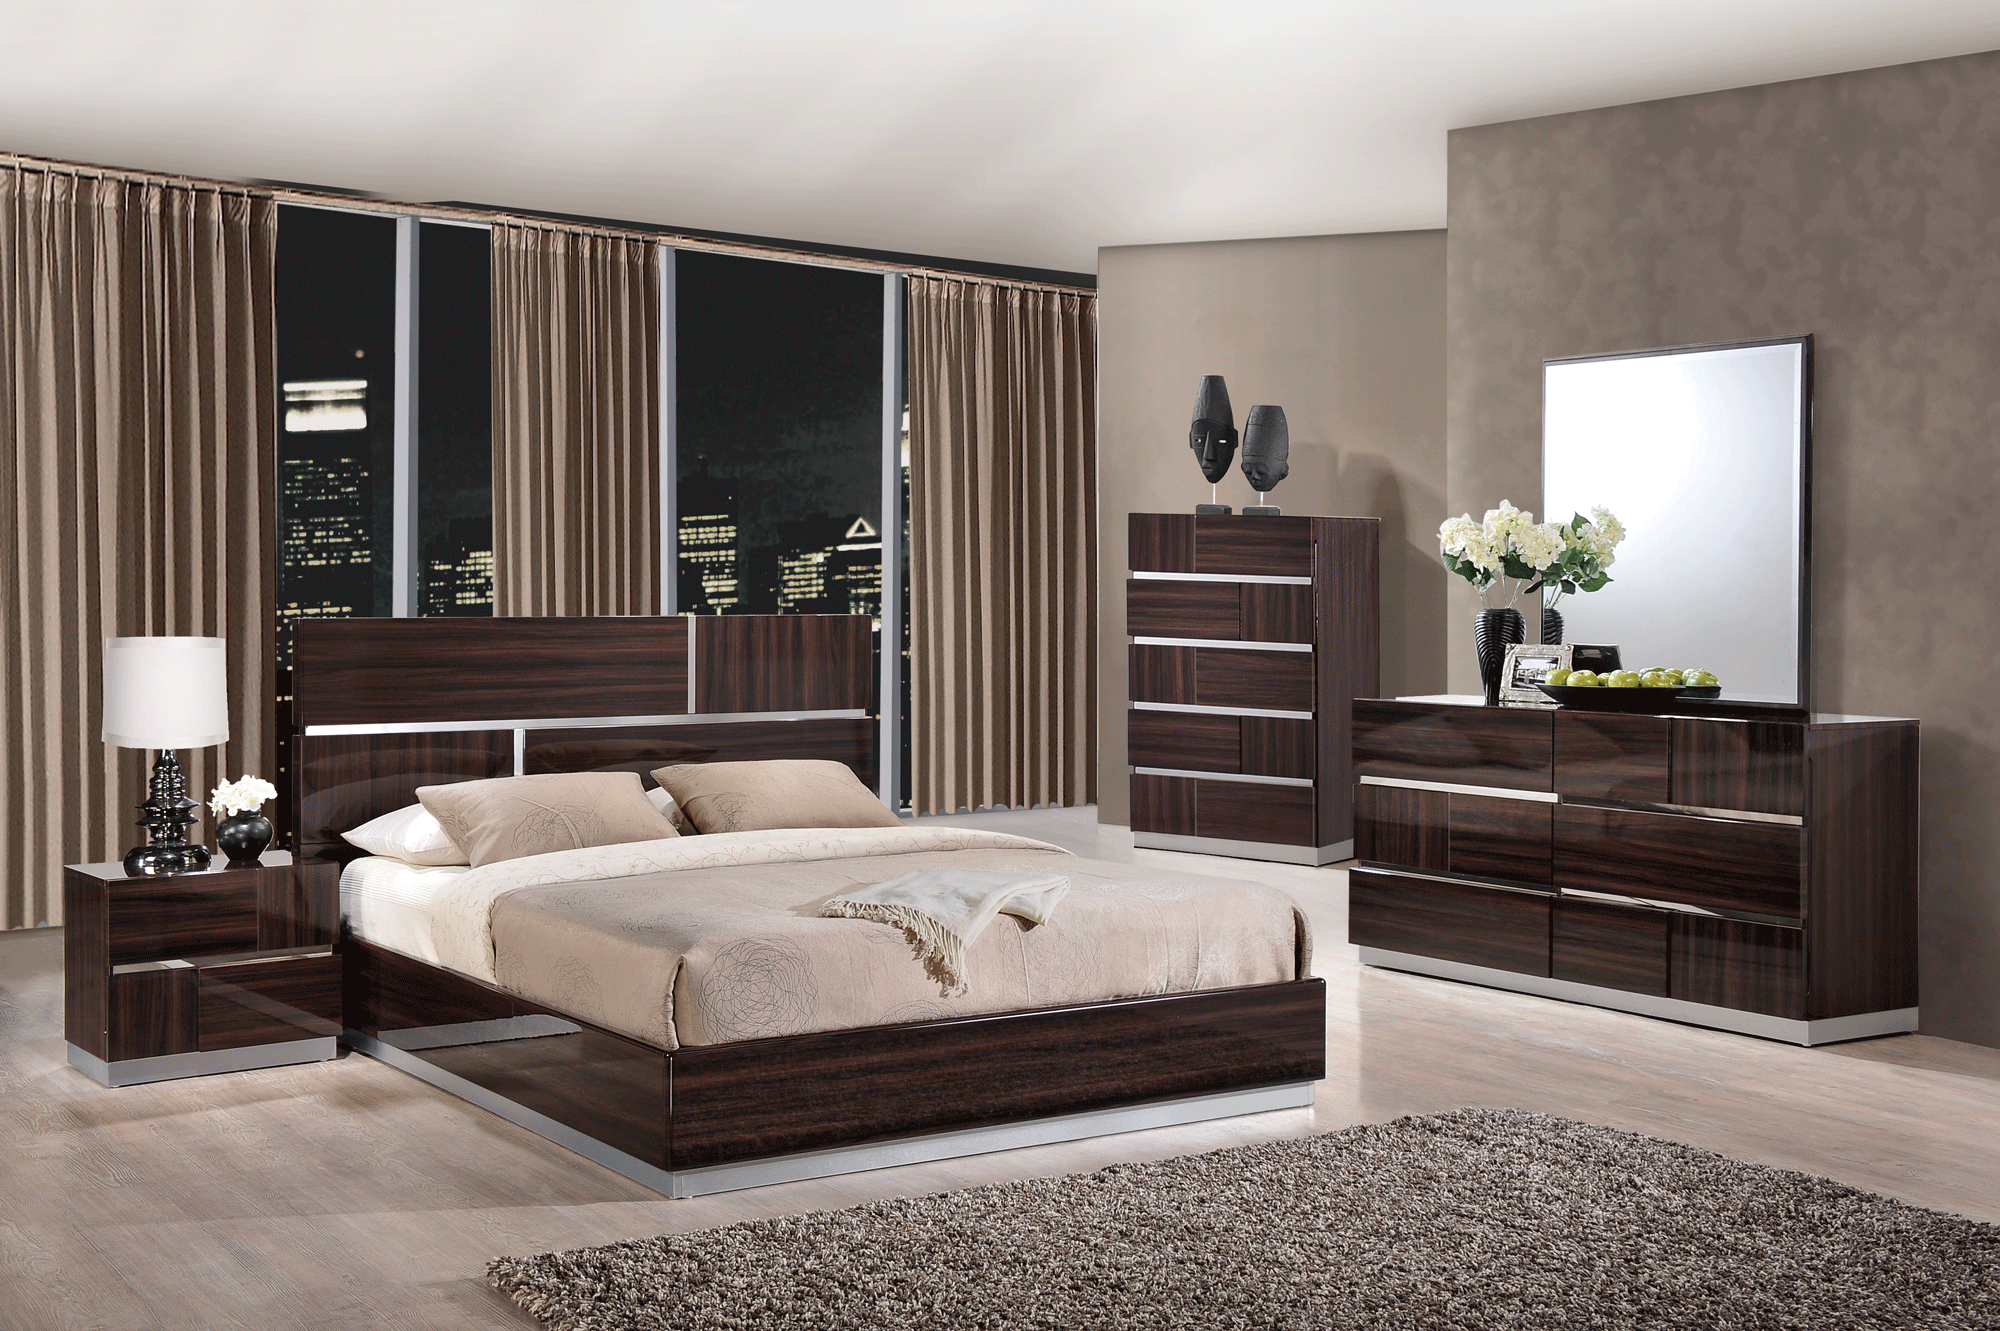 bedroom furniture chicago. Bedroom Furniture Chicago I